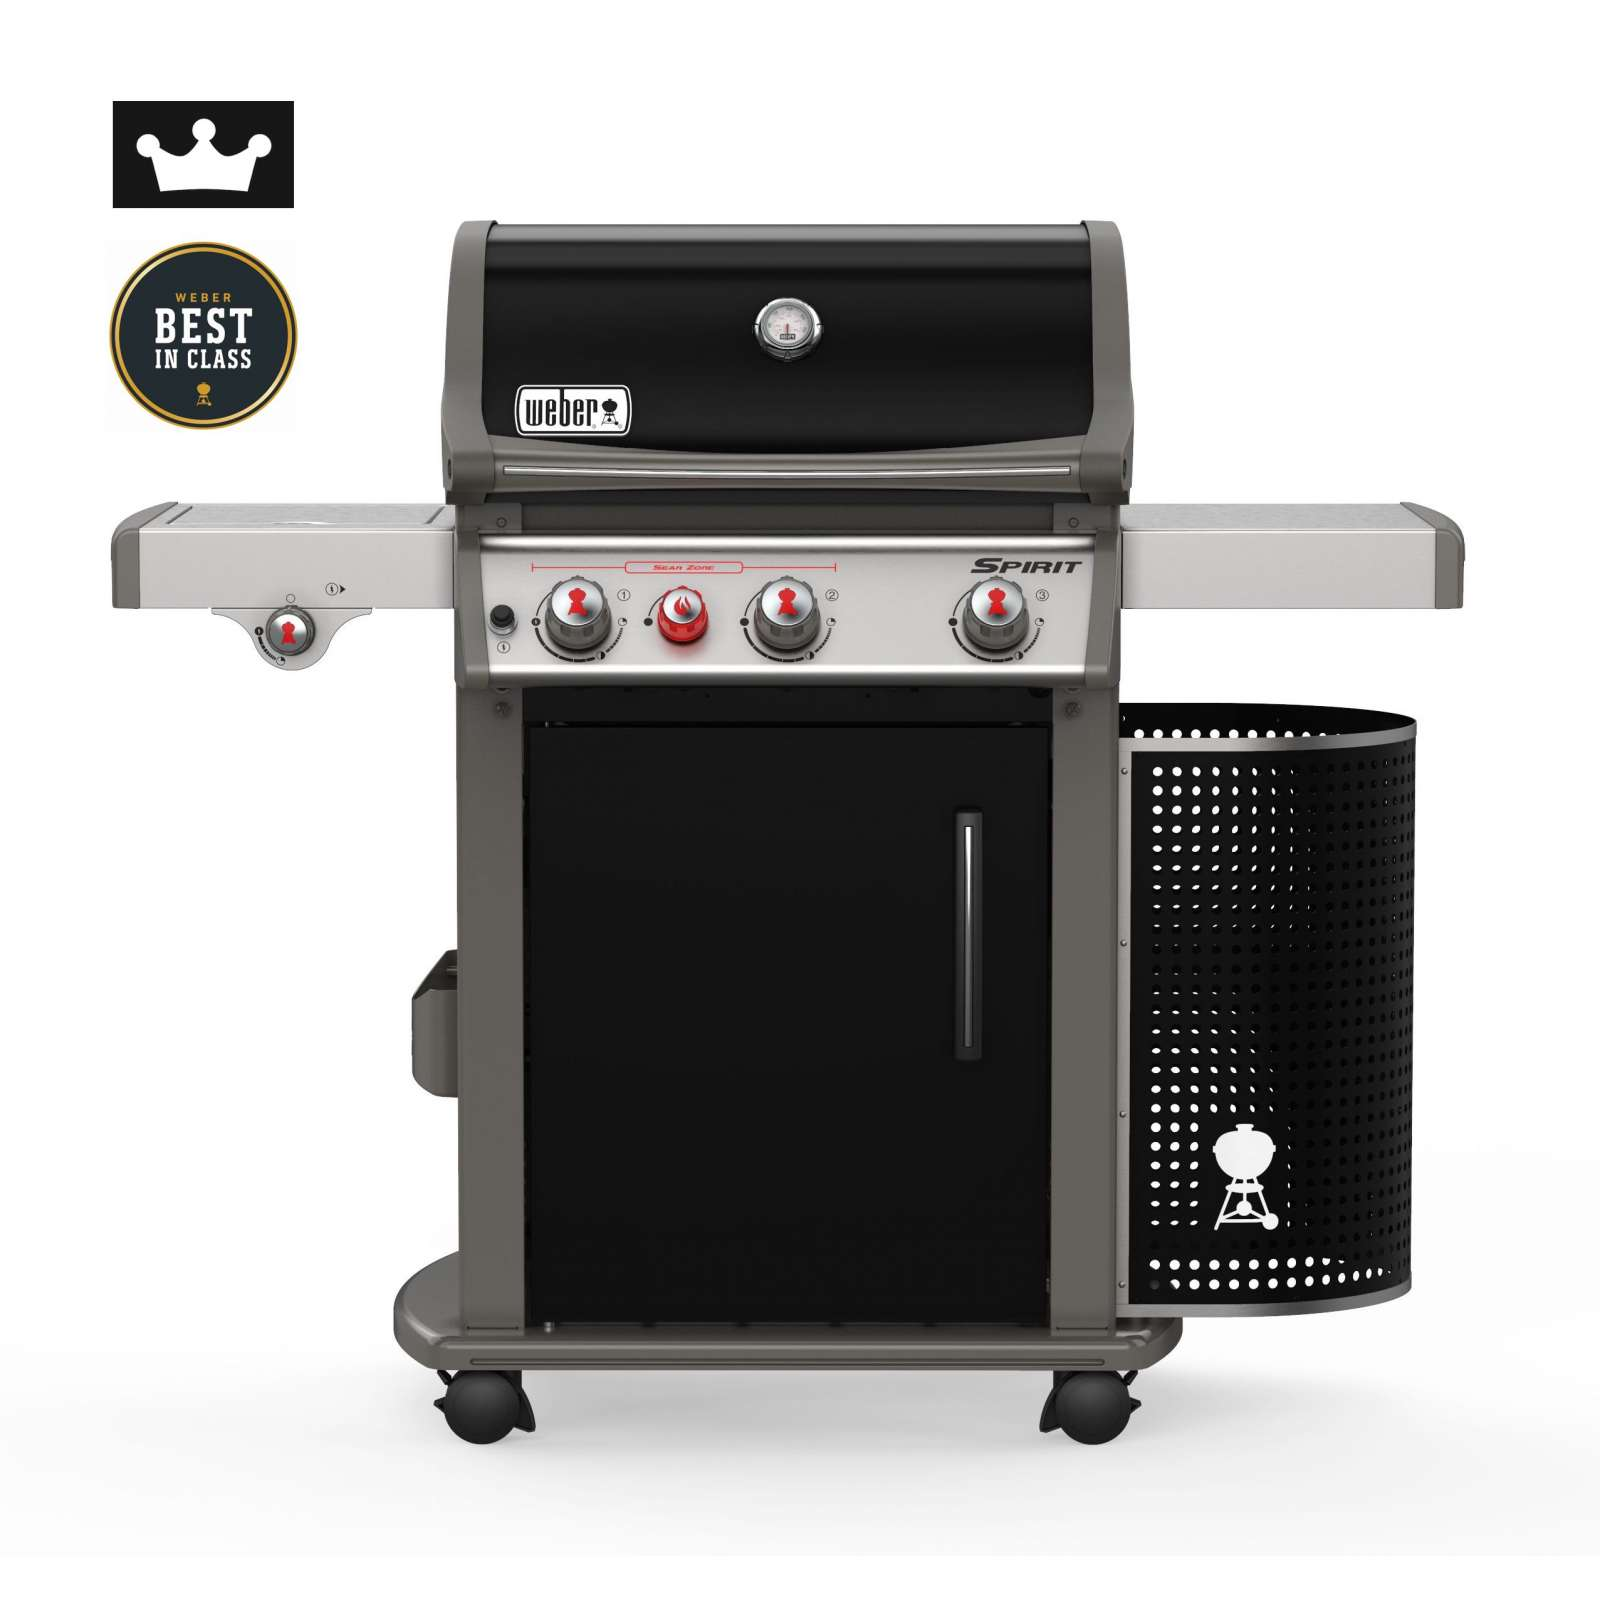 weber gasgrill spirit e 330 premium gbs mit premium abdeckhaube grillwelt24. Black Bedroom Furniture Sets. Home Design Ideas